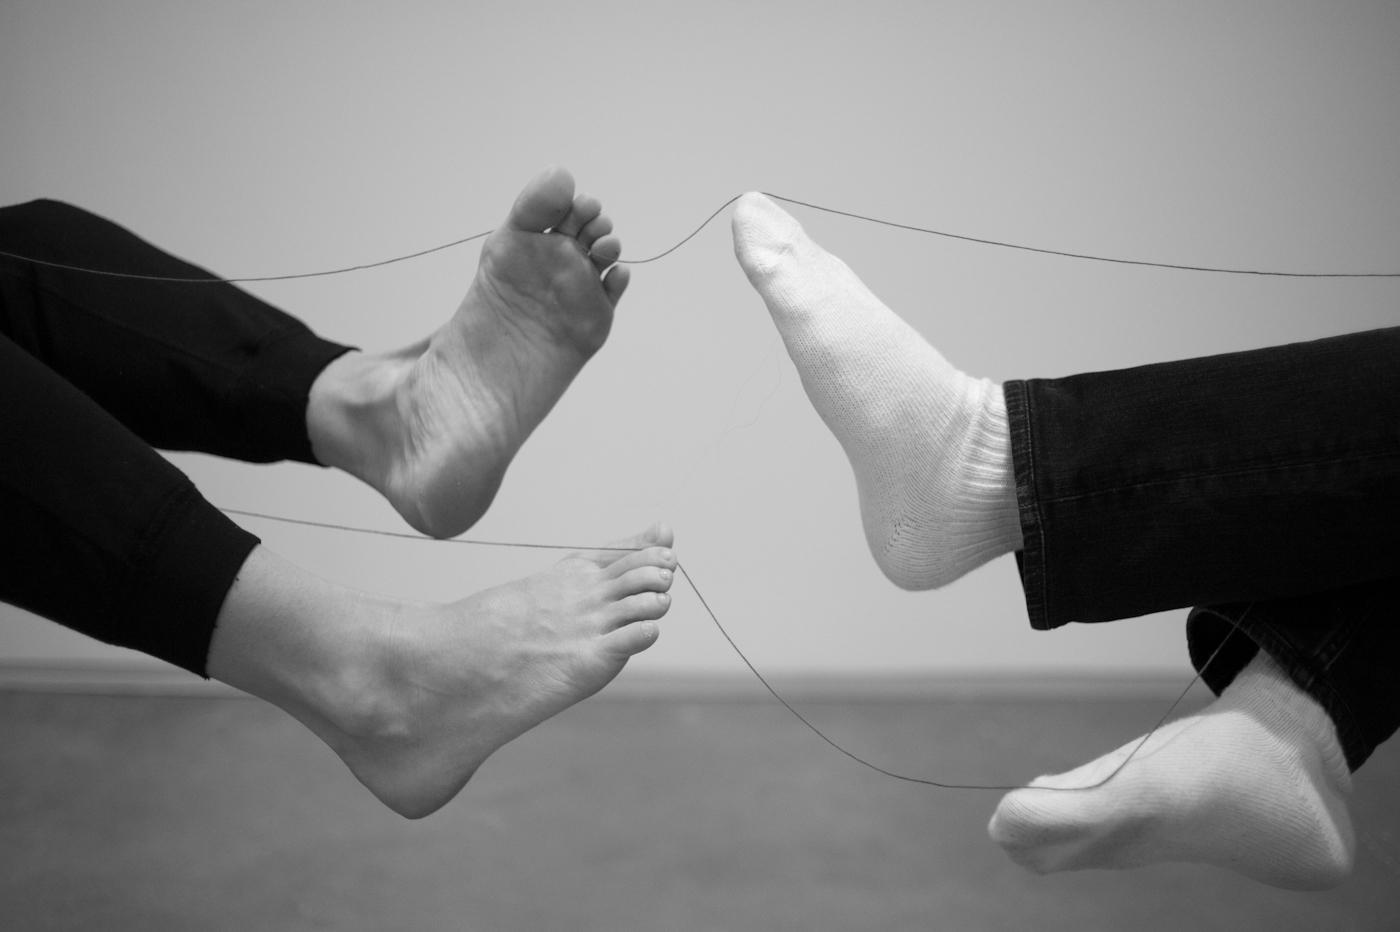 Trajal Harell, <i>Untitled Still Life Collection II</i>, 2011. Foto: Jaye R. Phillips. Cortesia do artista